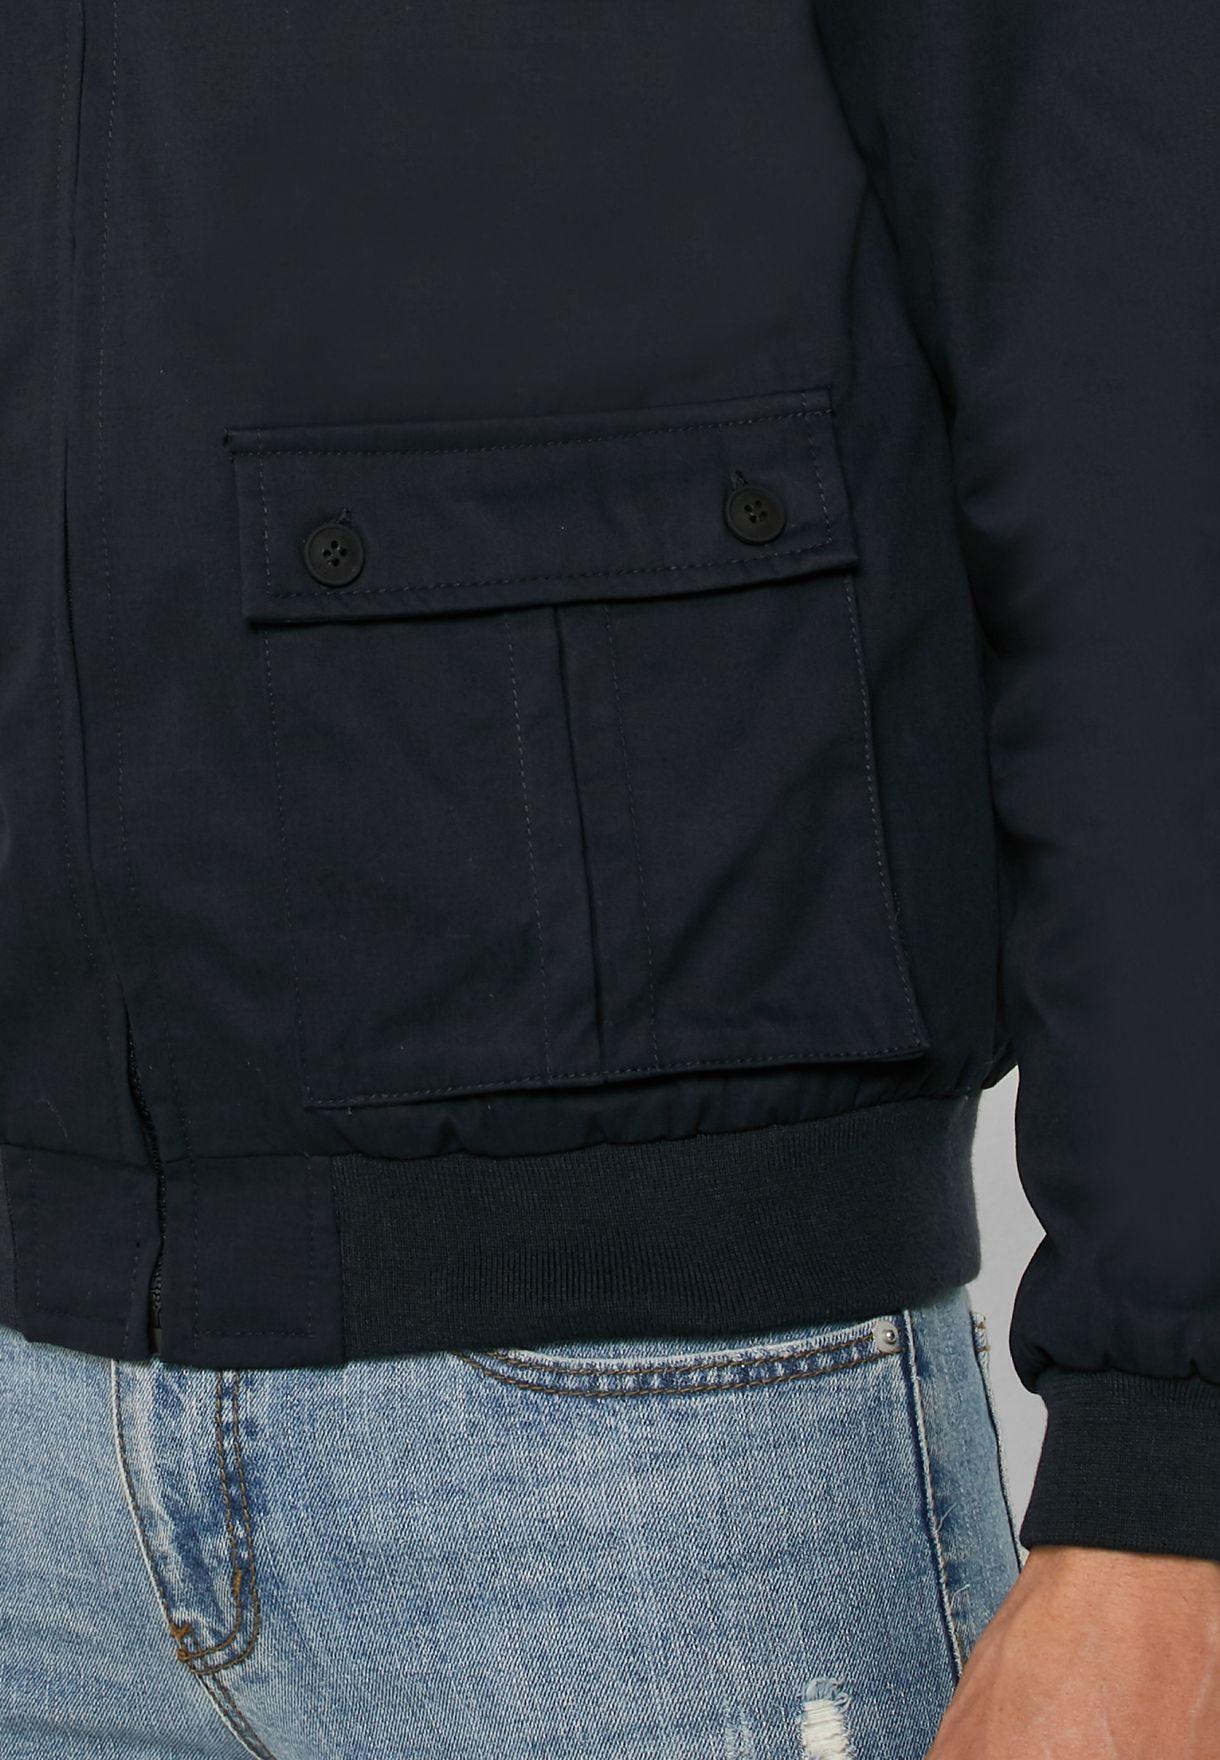 Pocket Harrington Jacket